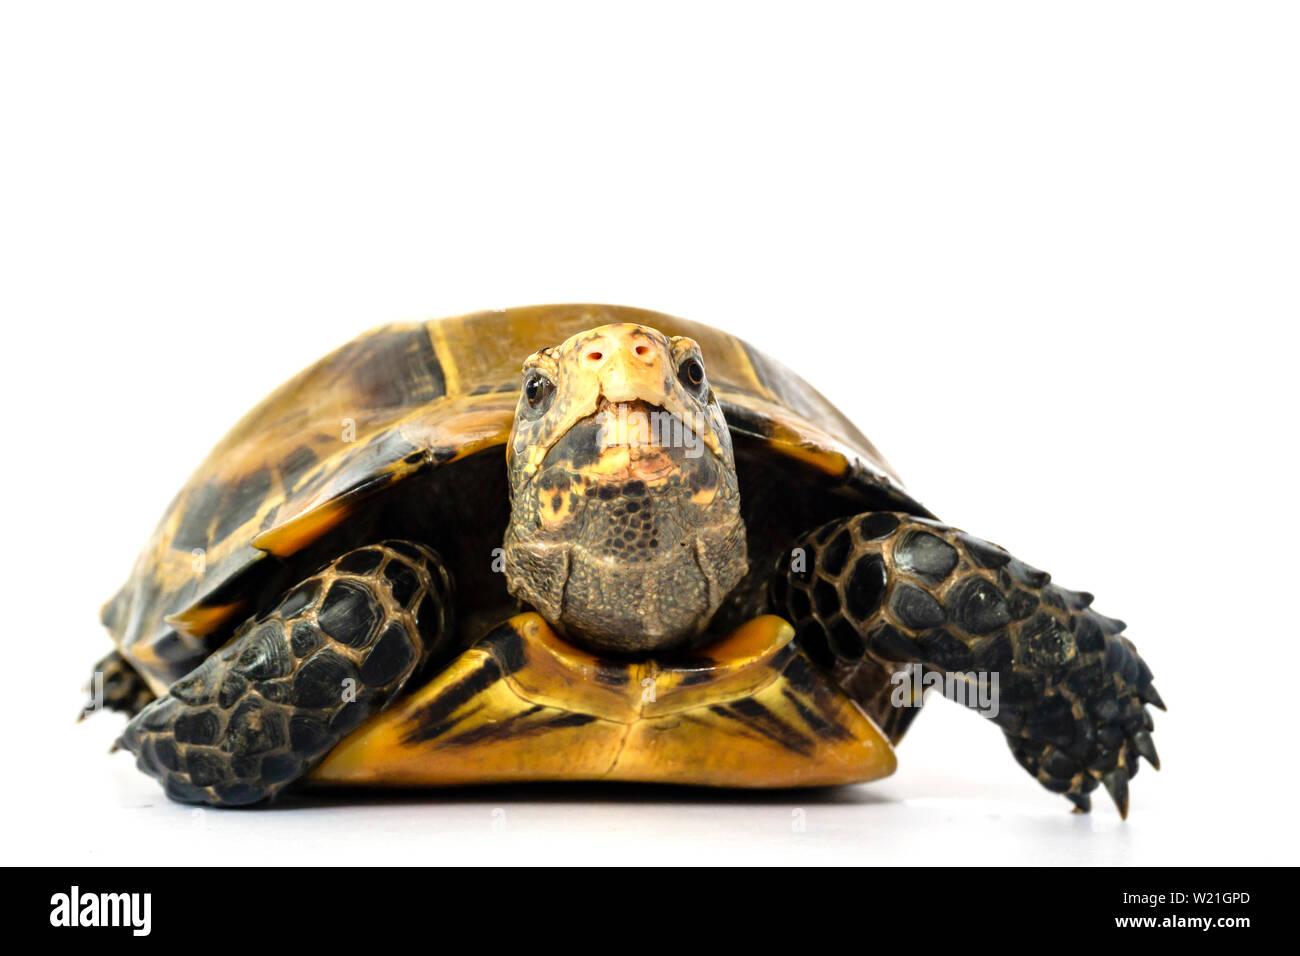 "Inland turtles in Asia are called ""Impressed tortoise, Manouria impressa "" isolated on white background.. Stock Photo"